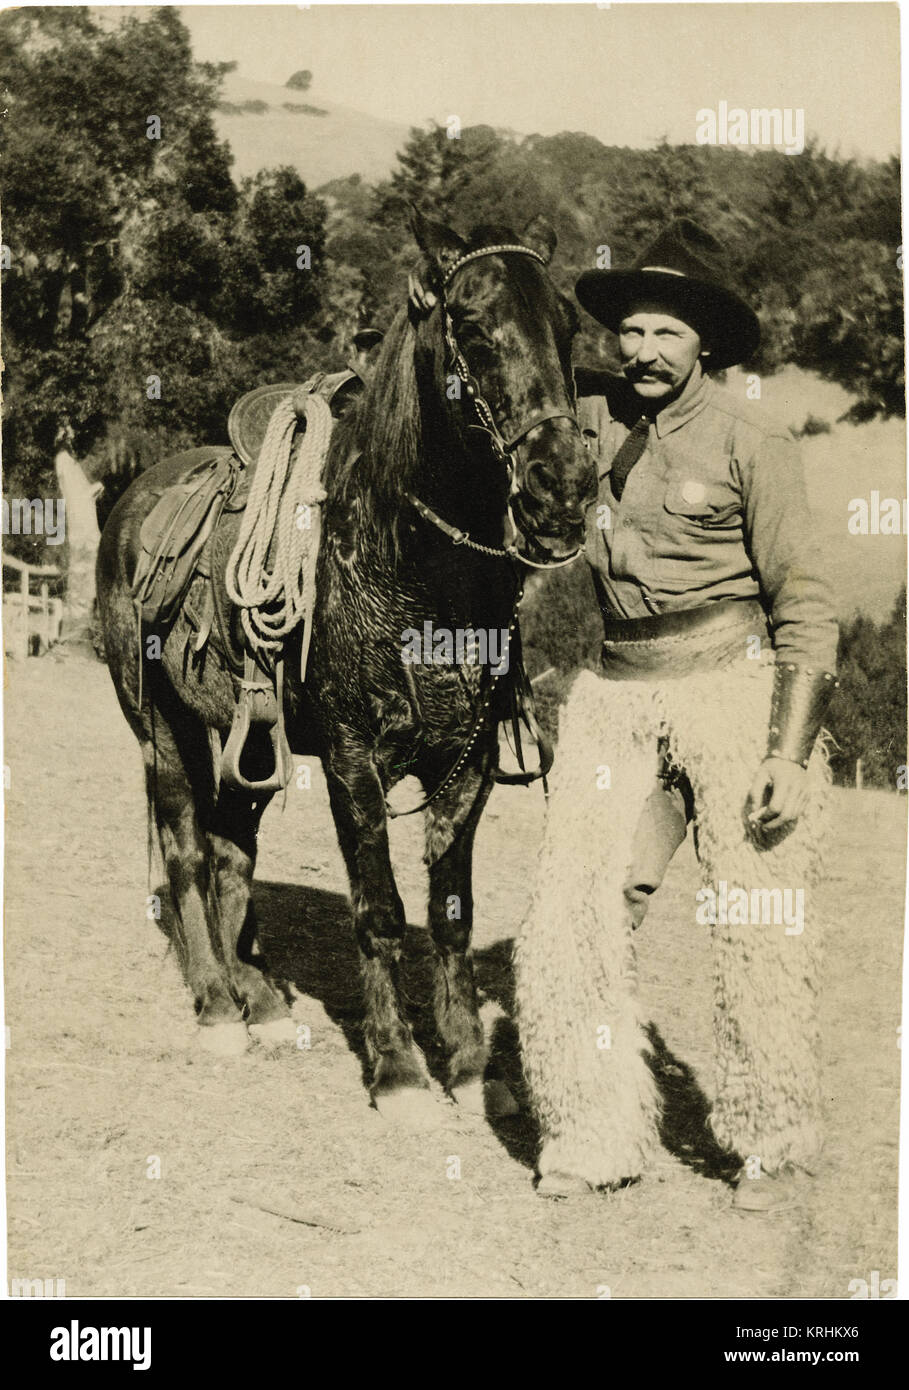 Cowboy de película Imagen De Stock